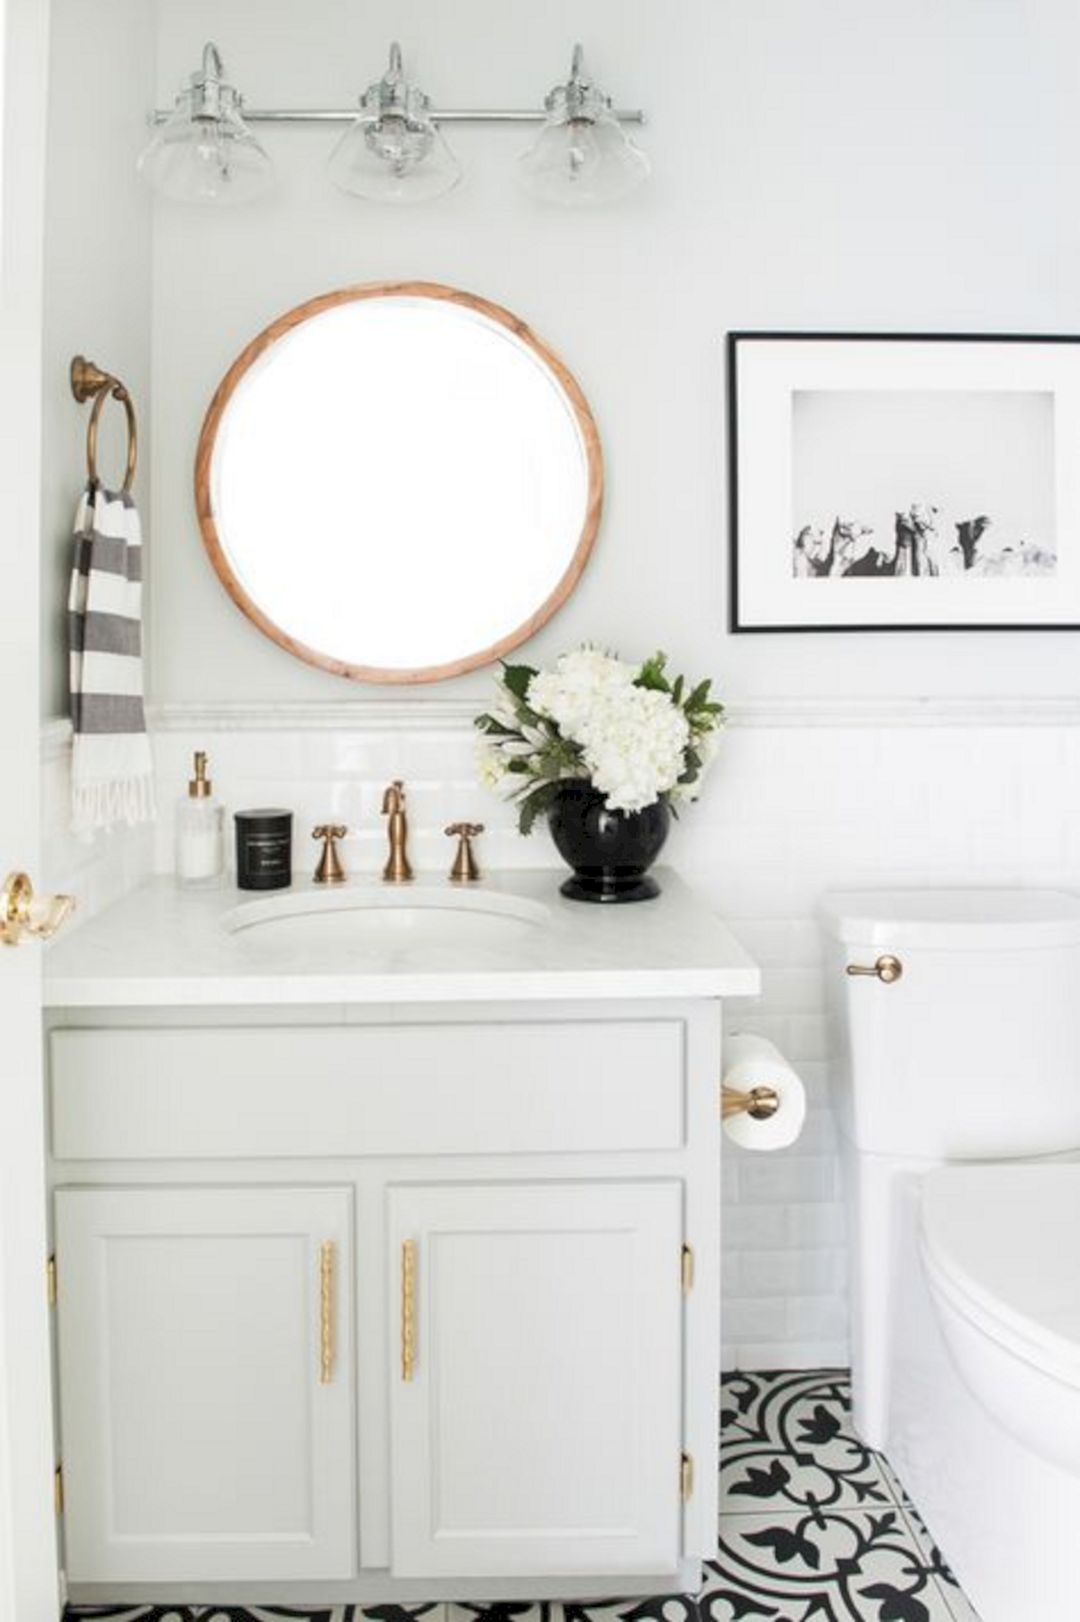 extraordinary concrete bathroom ideas | 115 Extraordinary Small Bathroom Designs For Small Space ...